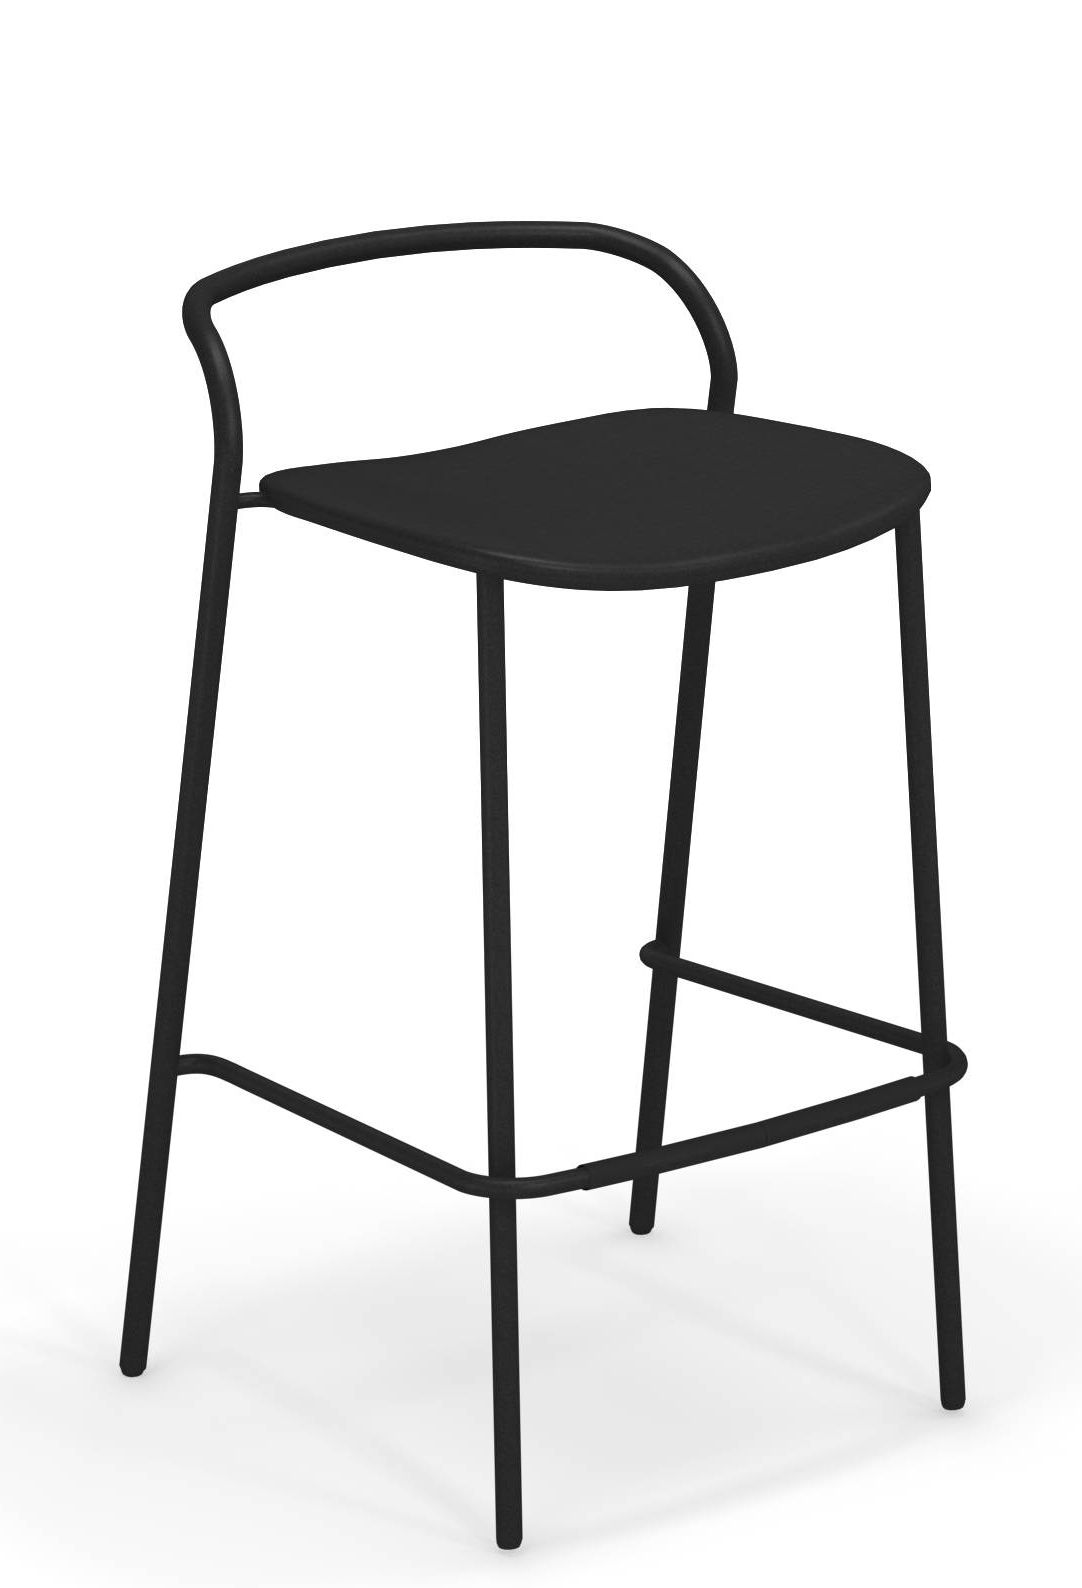 Möbel - Barhocker - Zahir Hochstuhl / H 75 cm - Metall - Emu - Schwarz - gefirnister Stahl